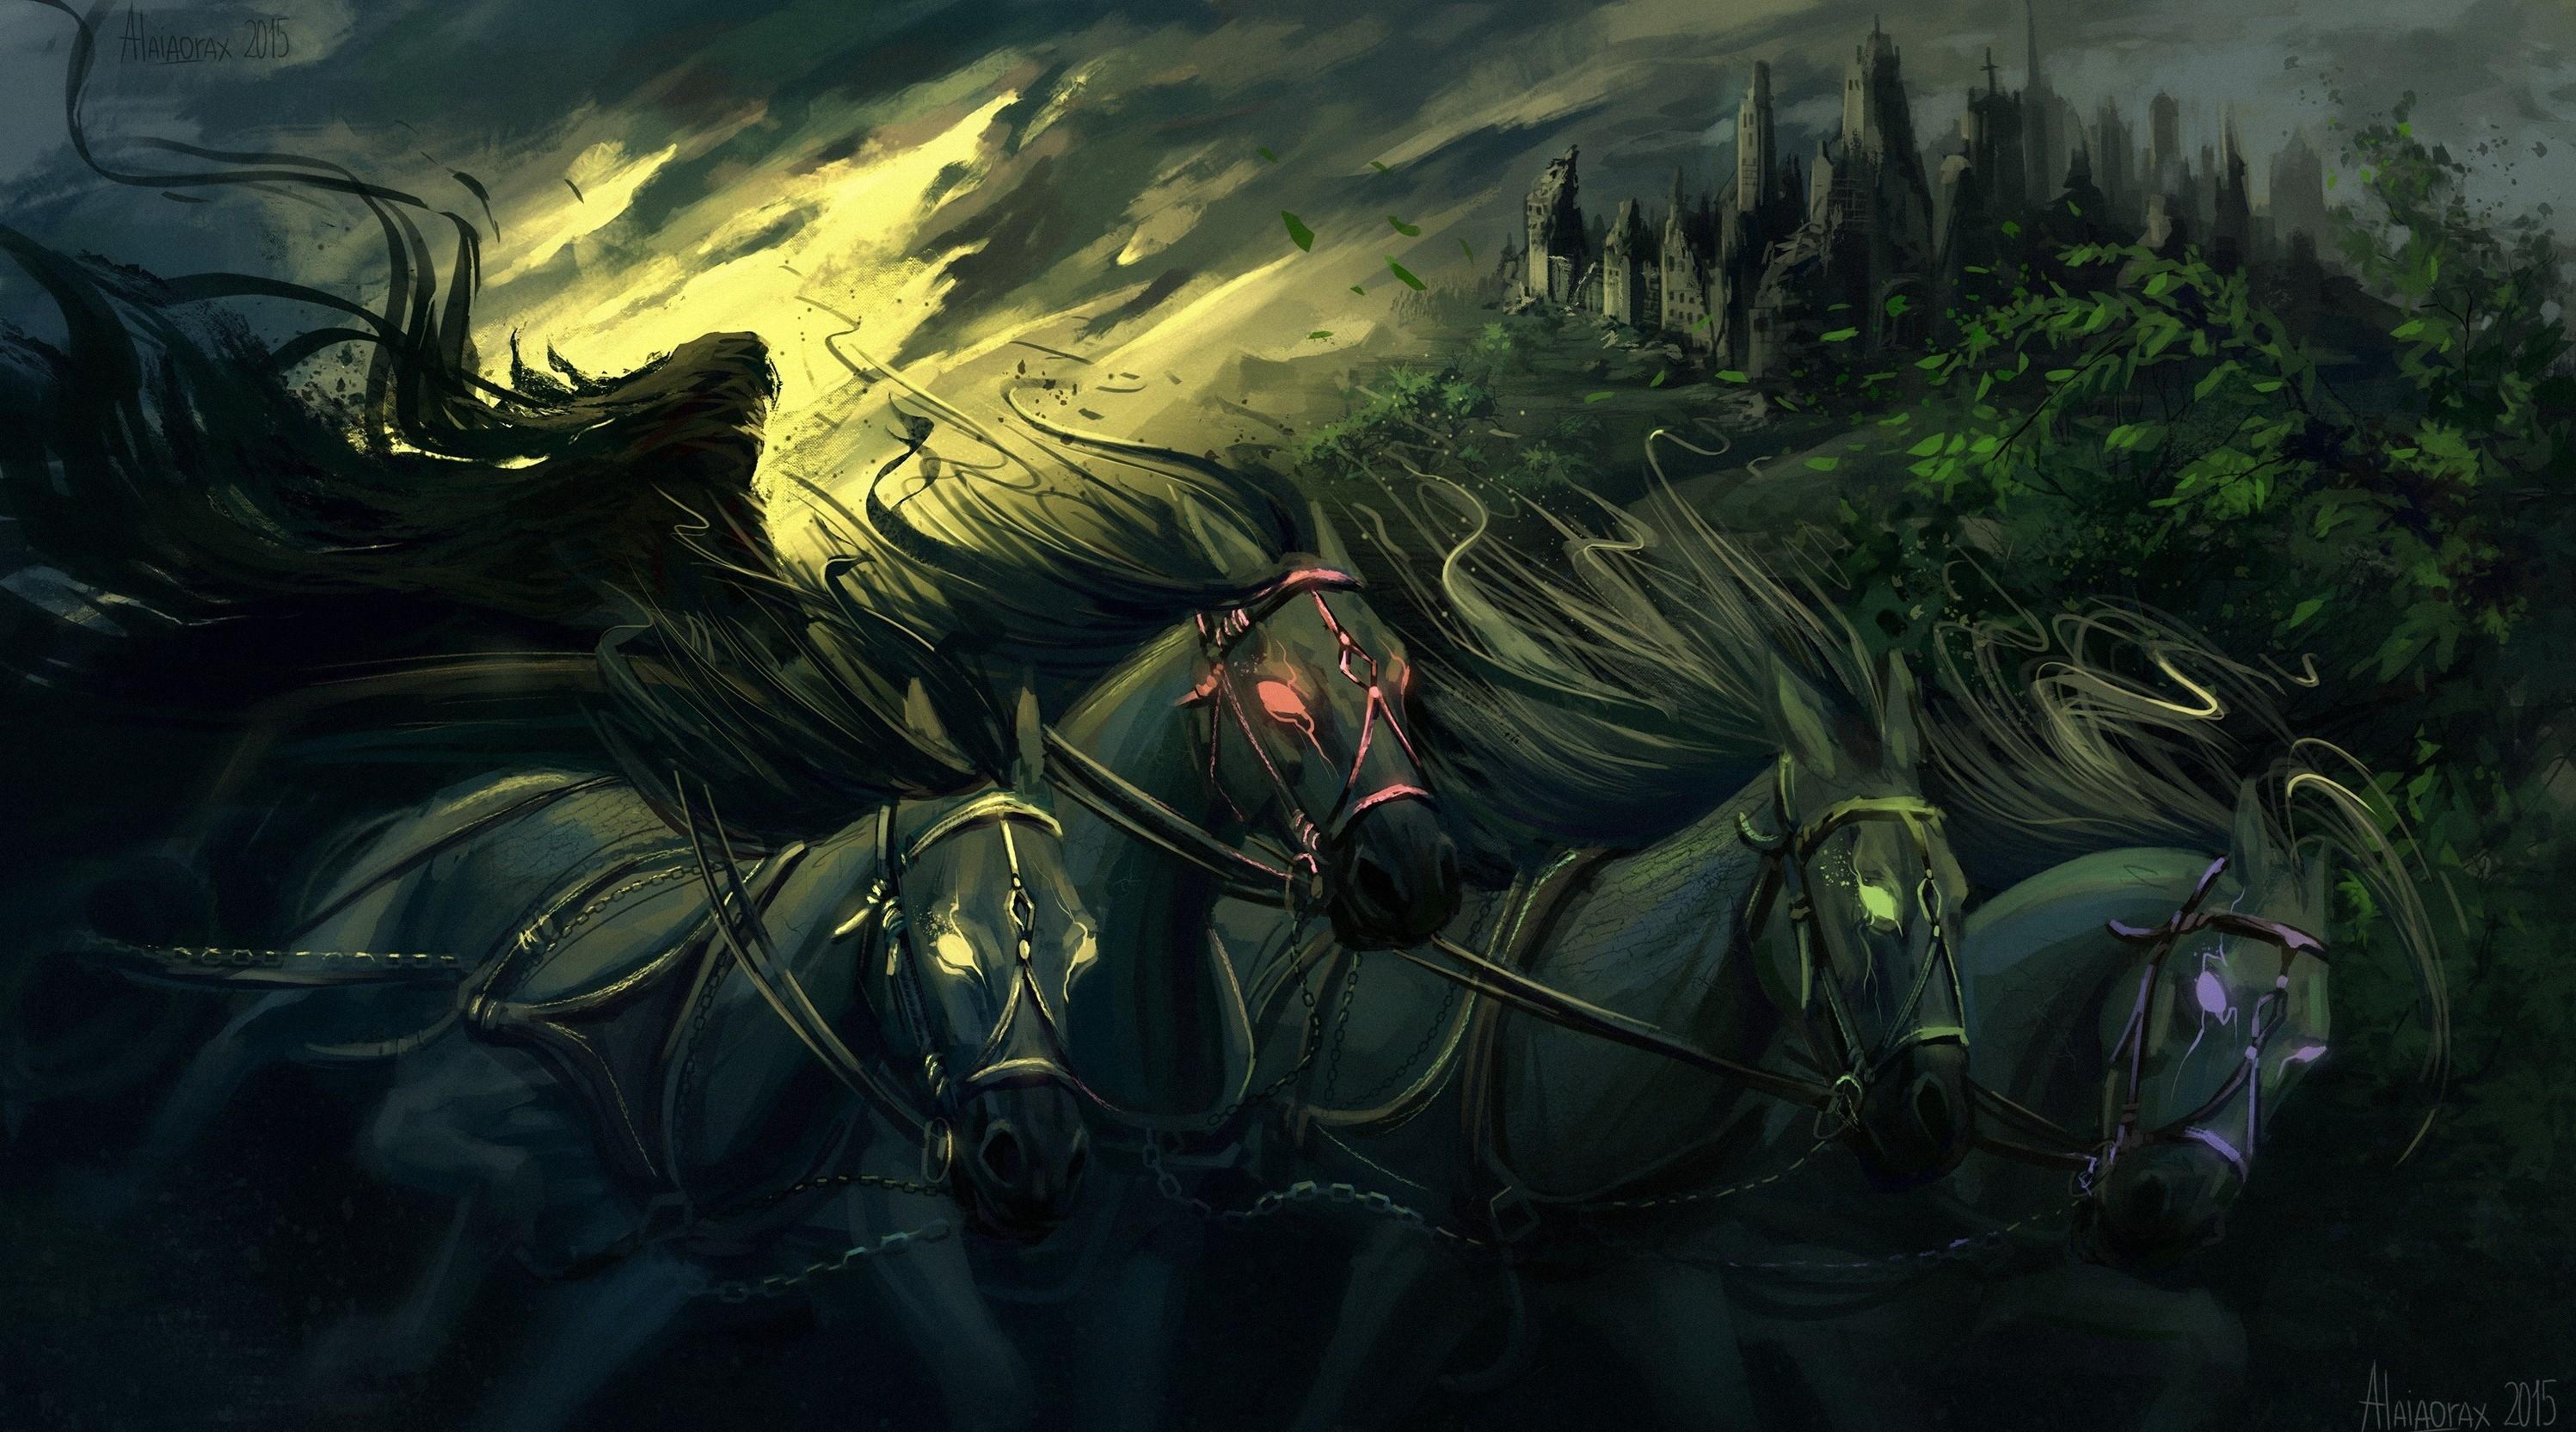 Wallpaper Fantasy Art Horse Artwork Death Grim Reaper